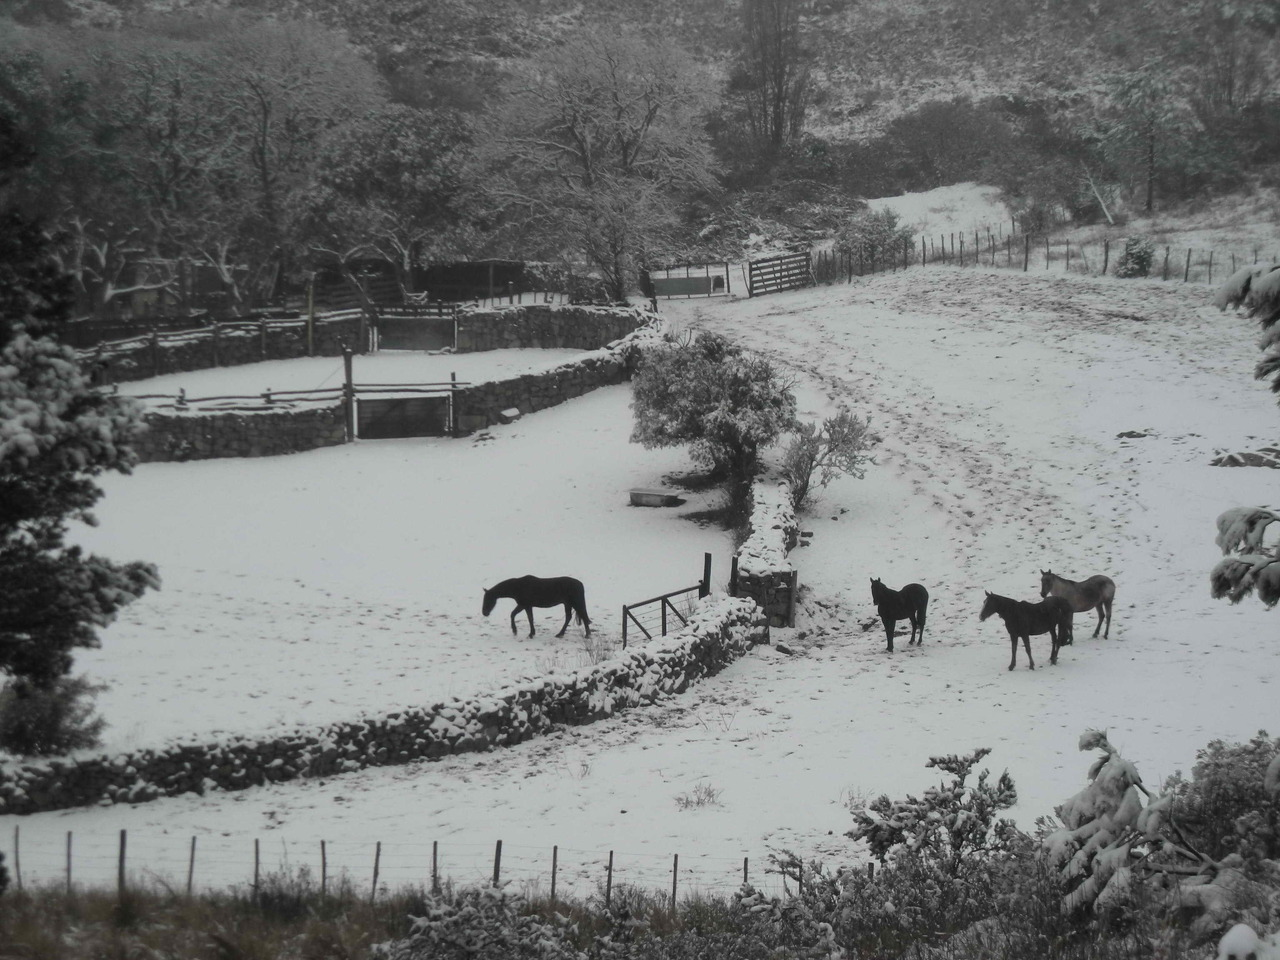 la+vrandjita+nevada+agosto+2011+017+B